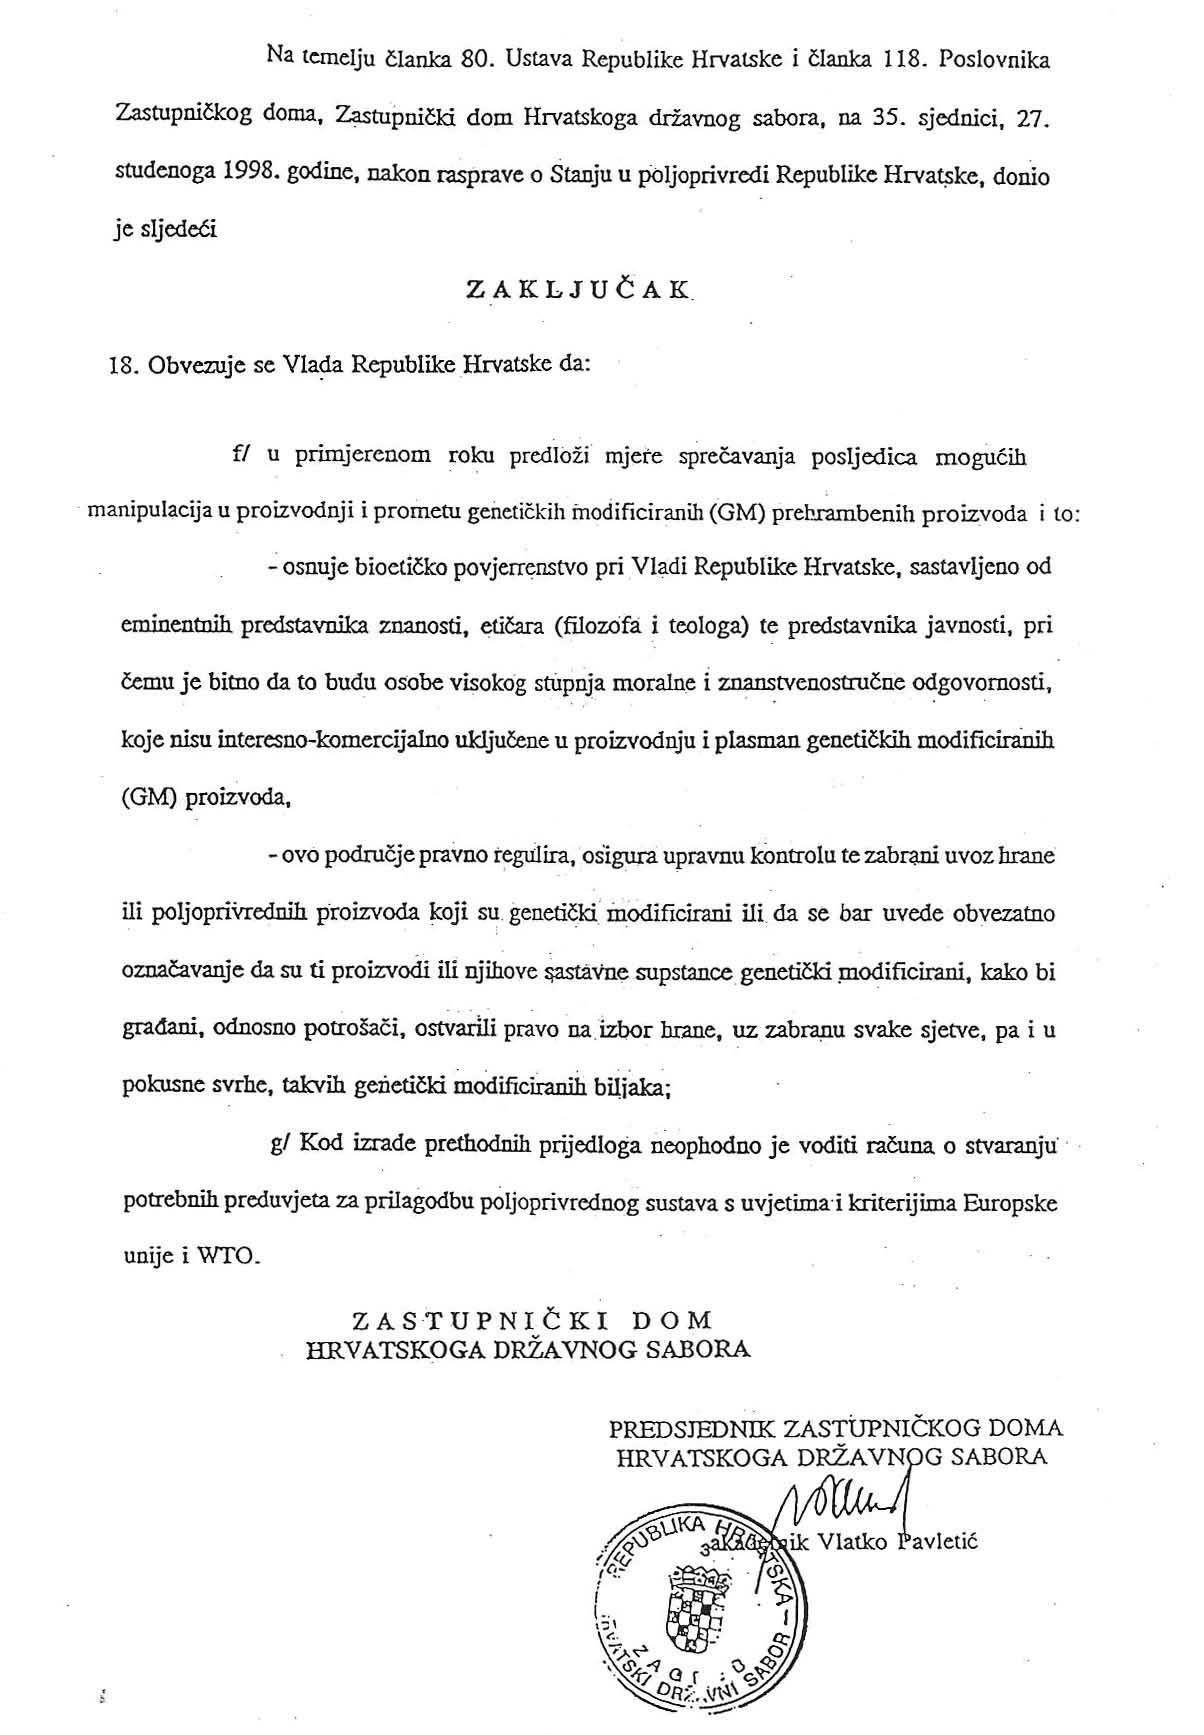 GMO - izum bez razuma - strana 324 - Zakljucak Sabora